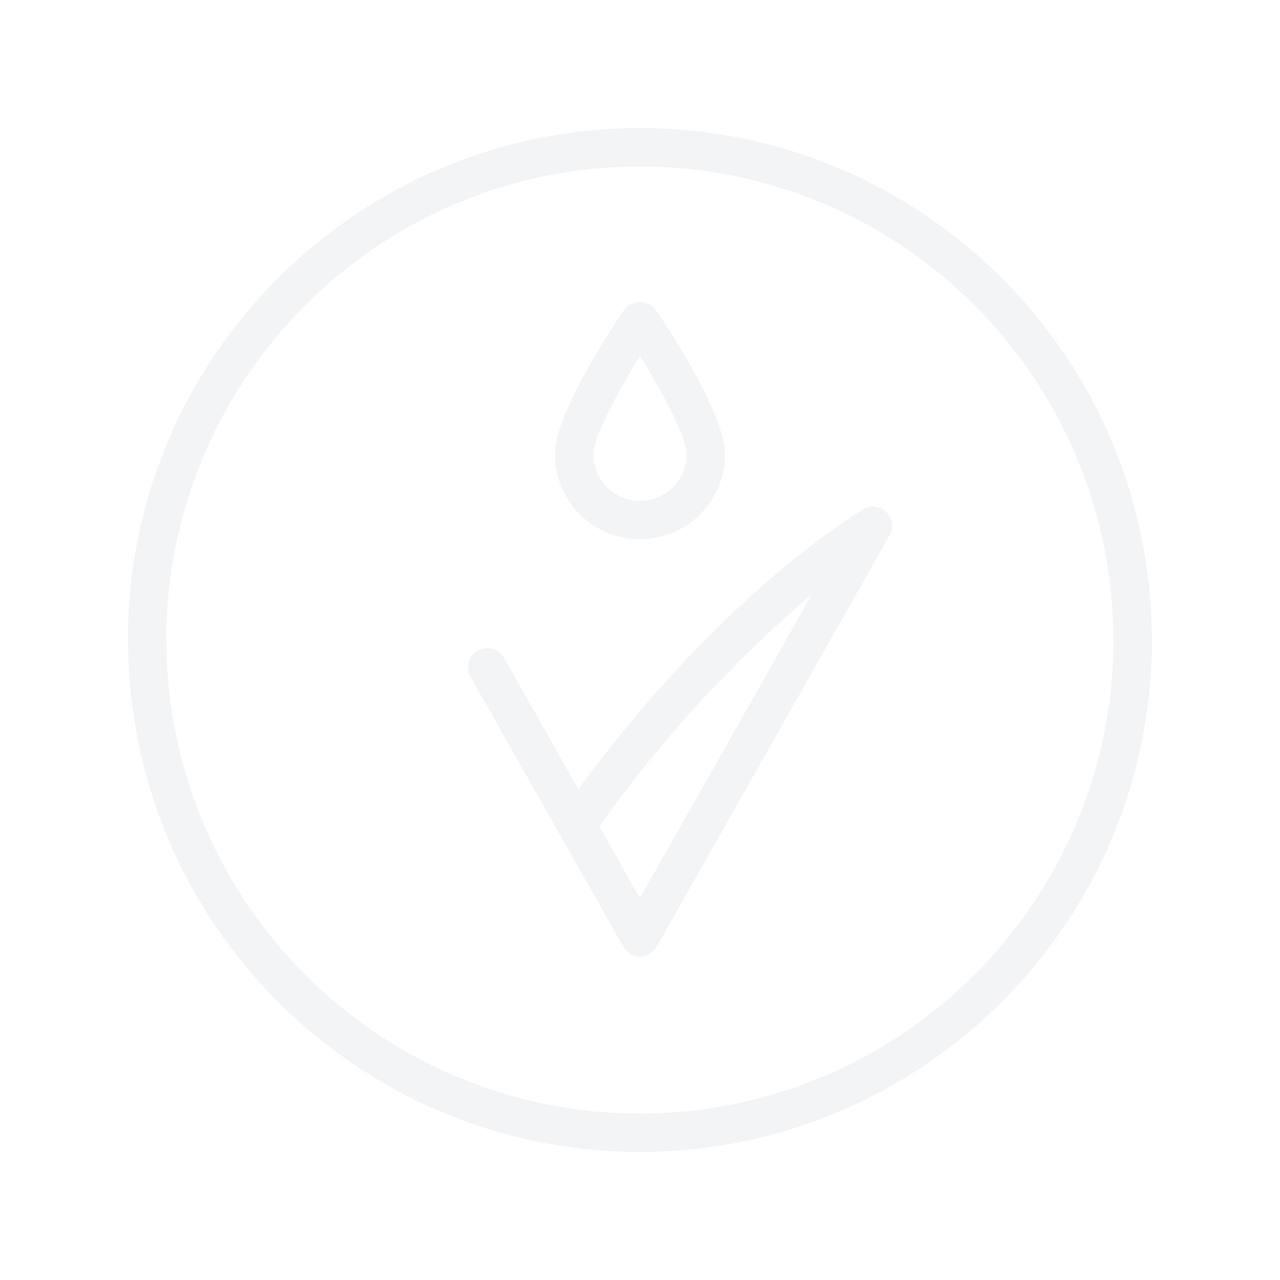 LANCOME Skin Feels Good Tint SPF23 32ml